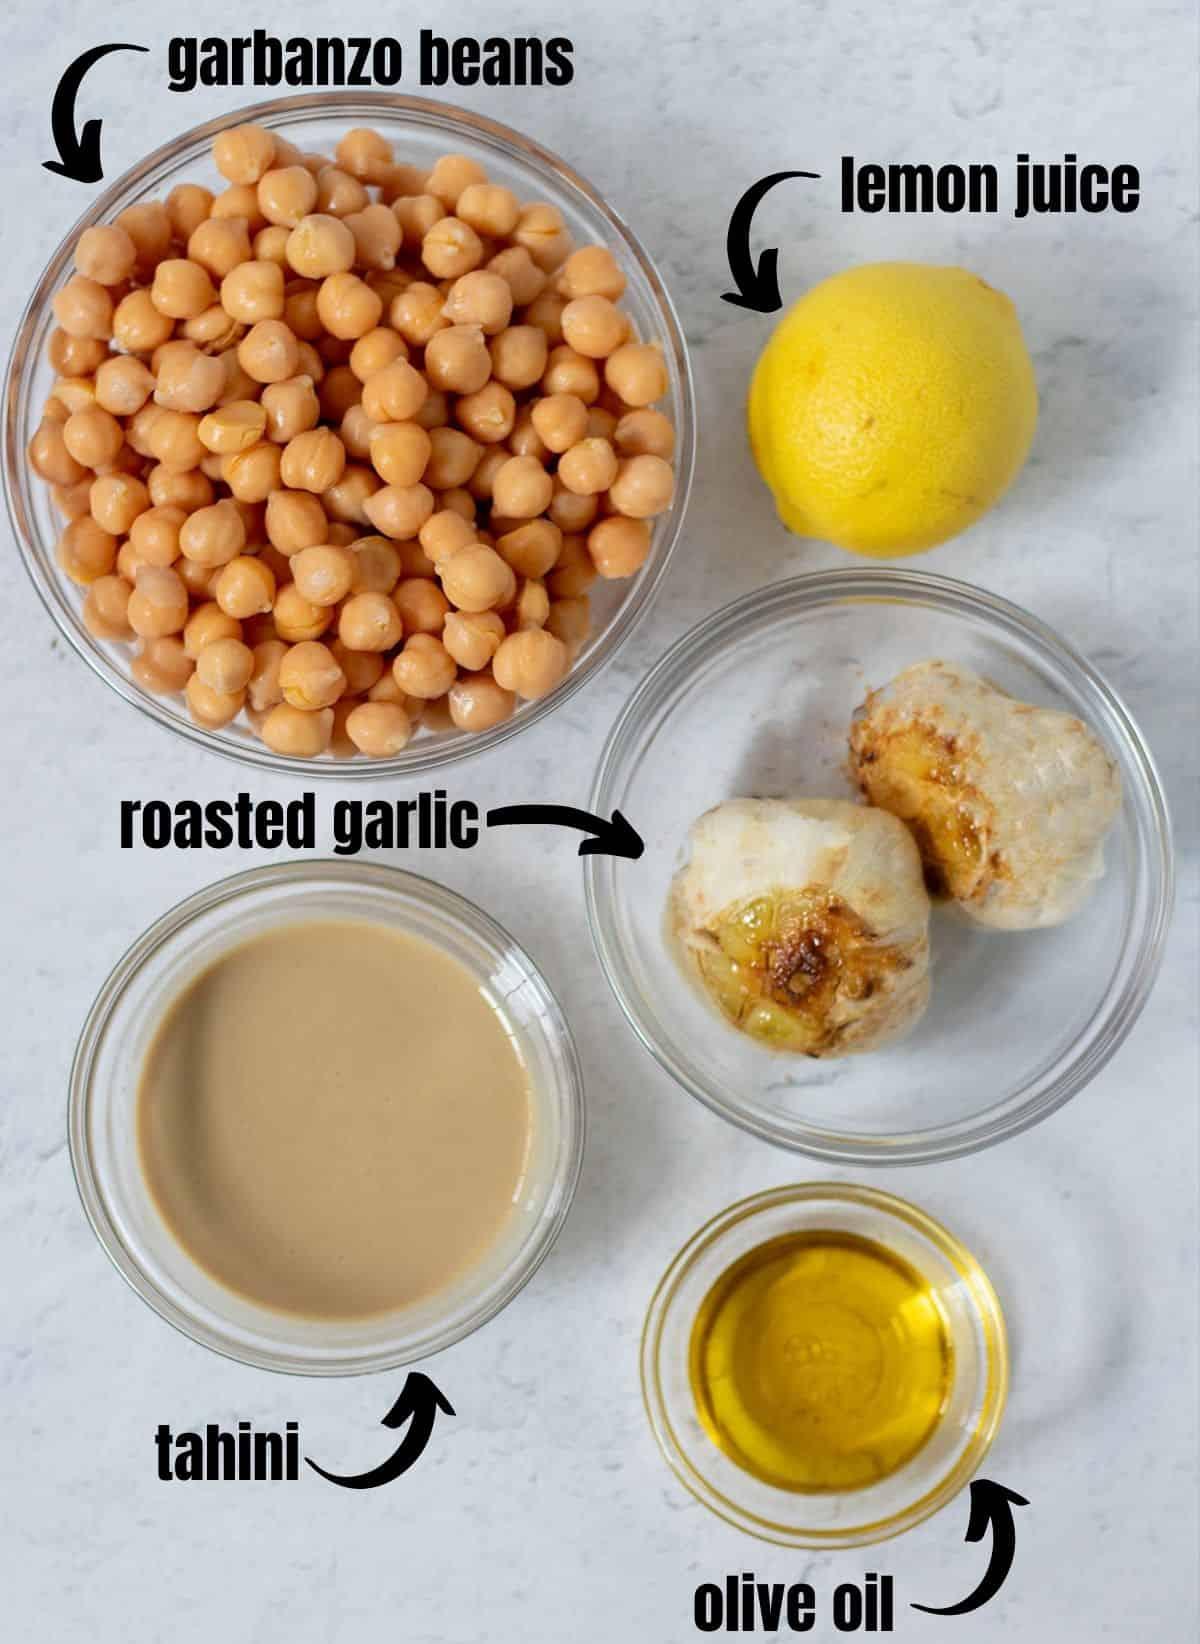 garbanzo beans, lemon juice, roasted garlic, tahini, olive oil.